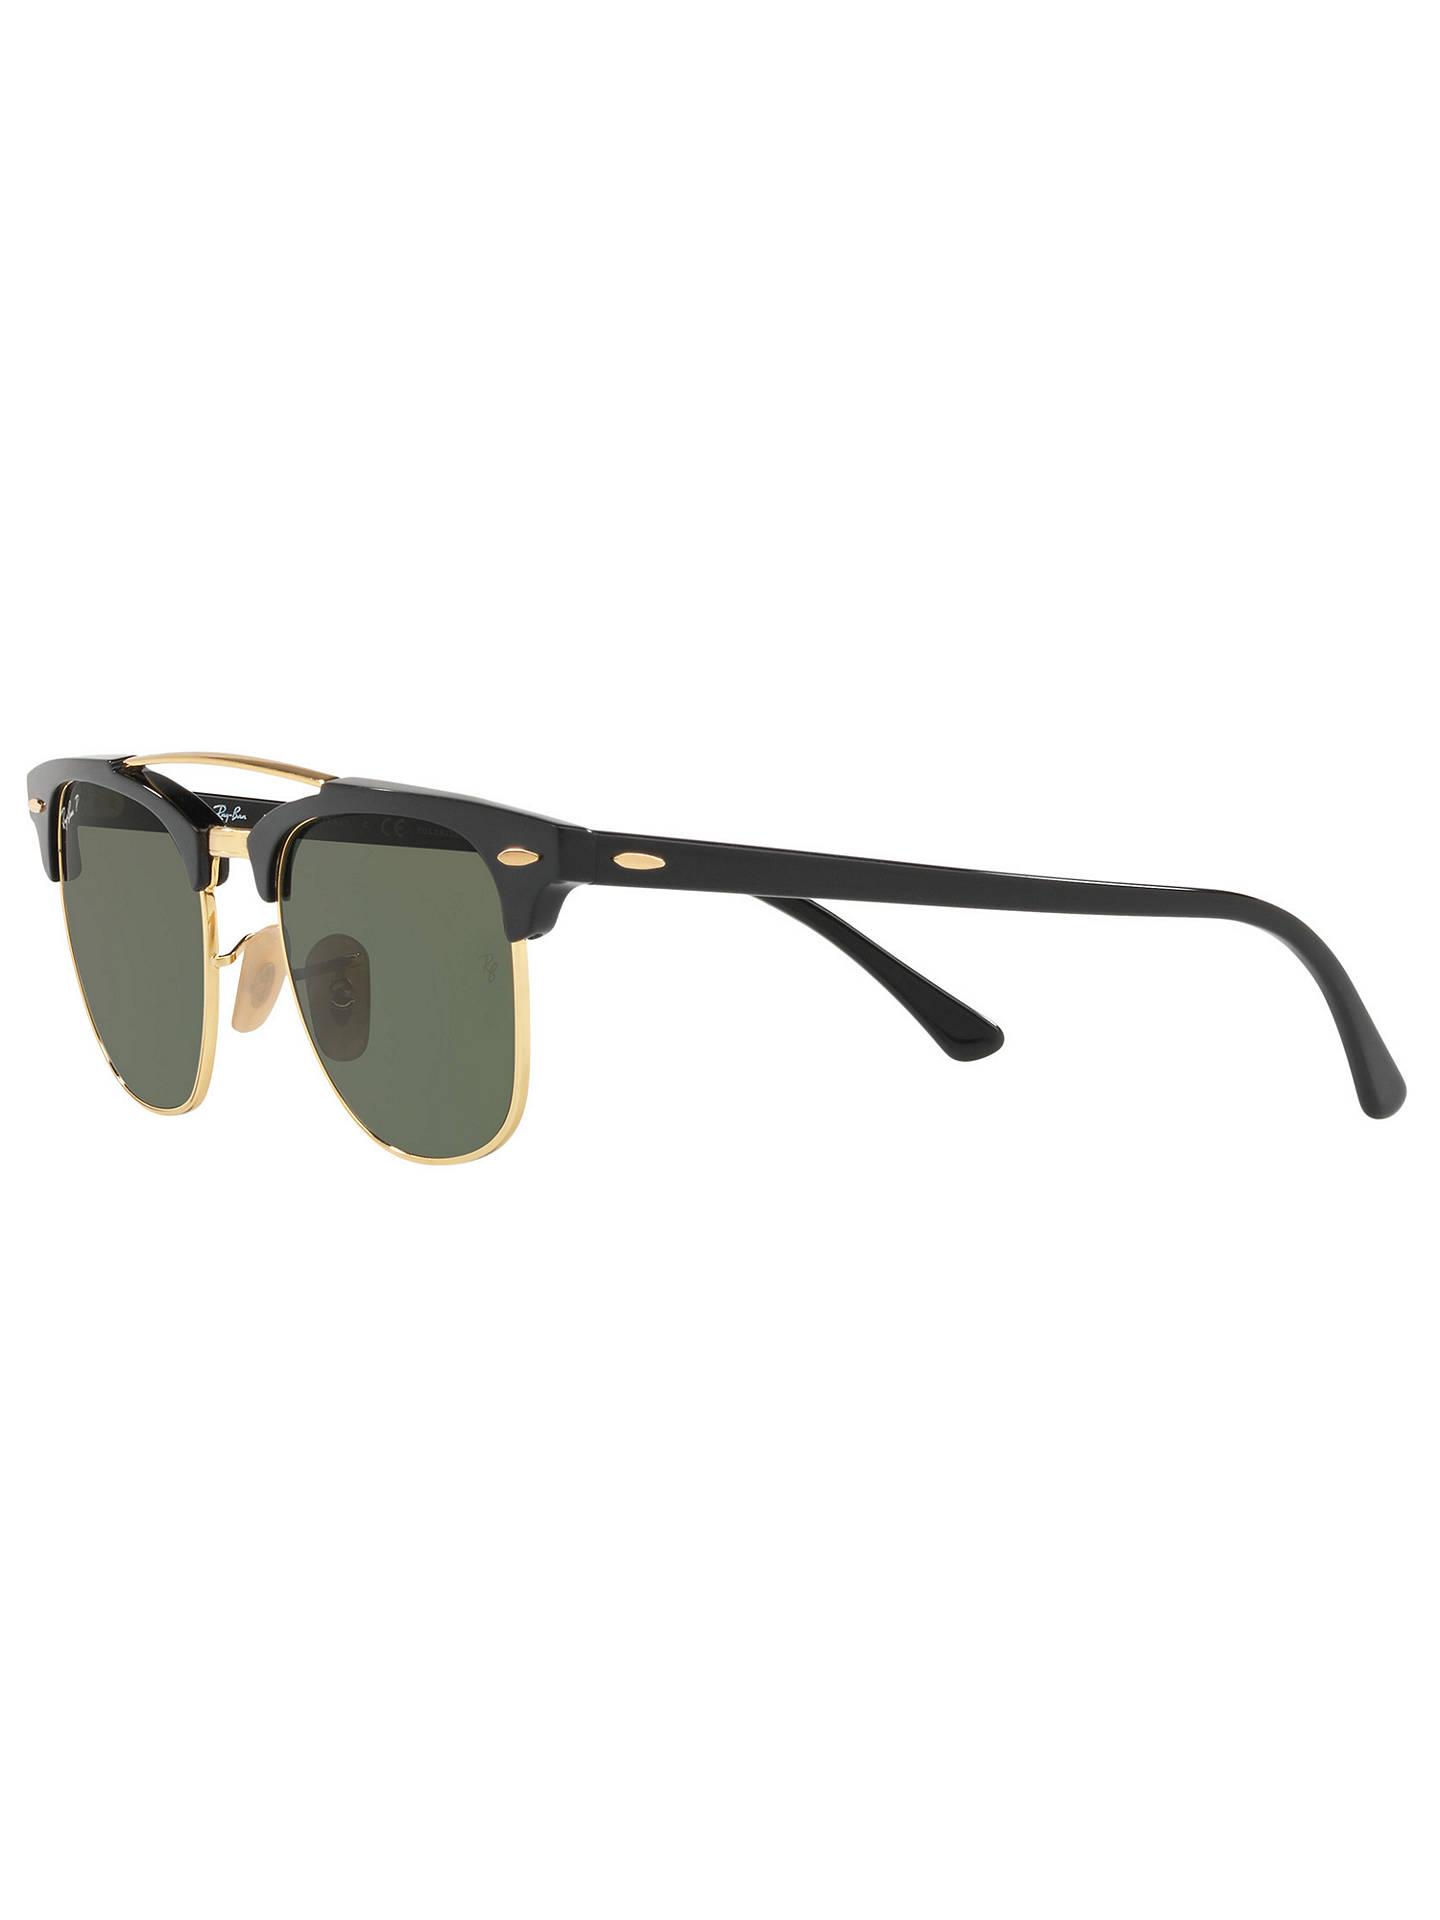 0120d712b5415 ... Buy Ray-Ban RB3816 Polarised Wayfarer Sunglasses